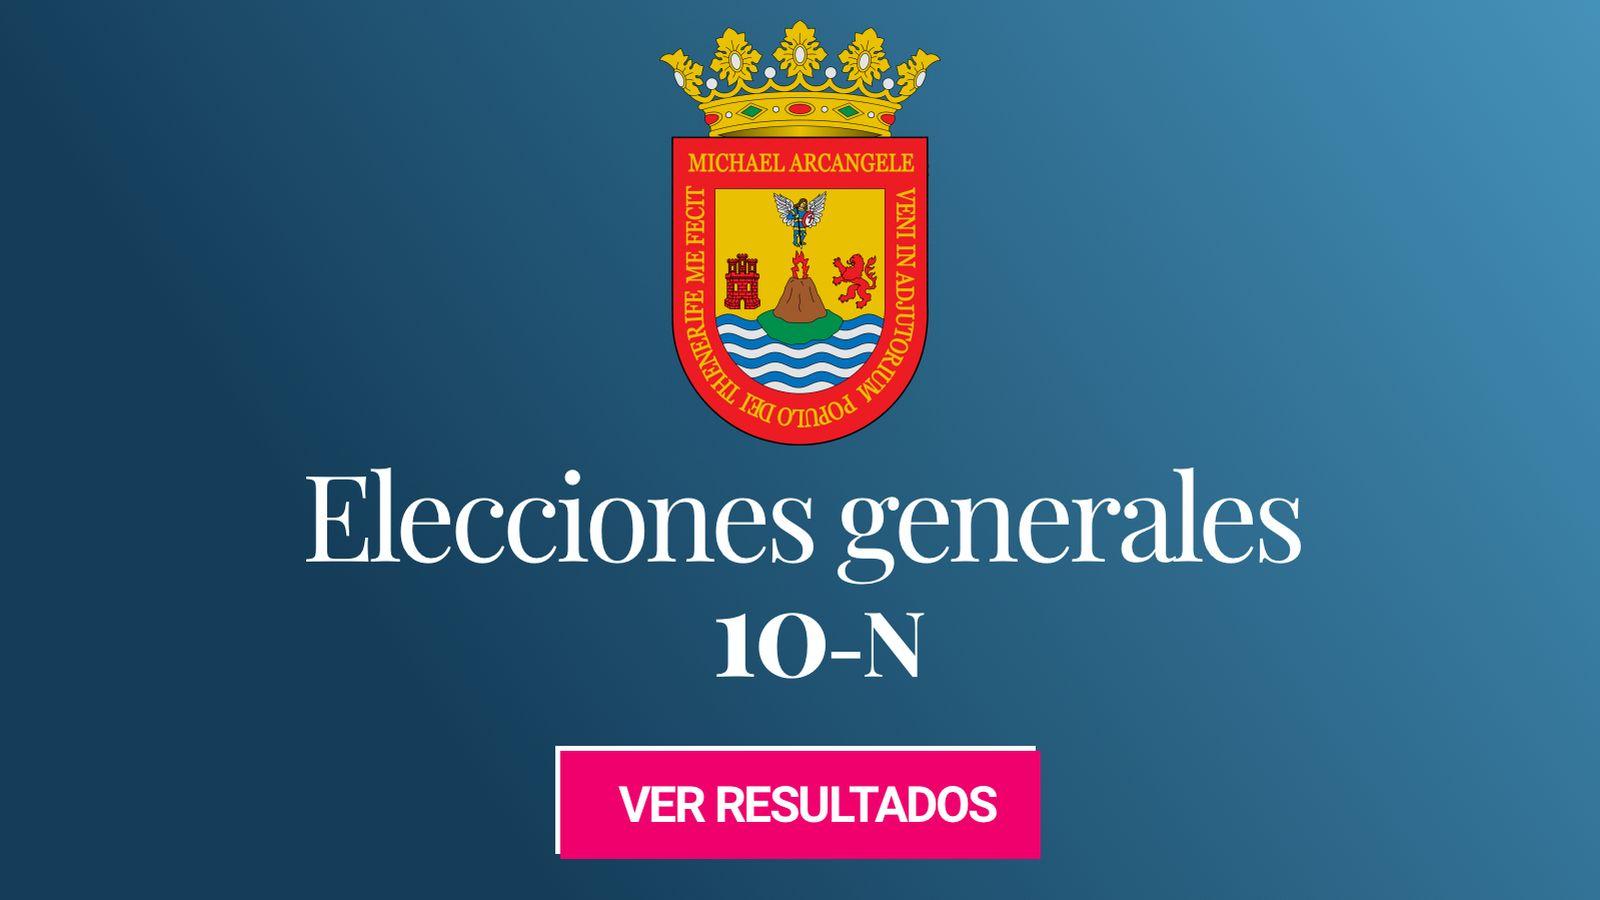 Foto: Elecciones generales 2019 en San Cristóbal de La Laguna. (C.C./EC)